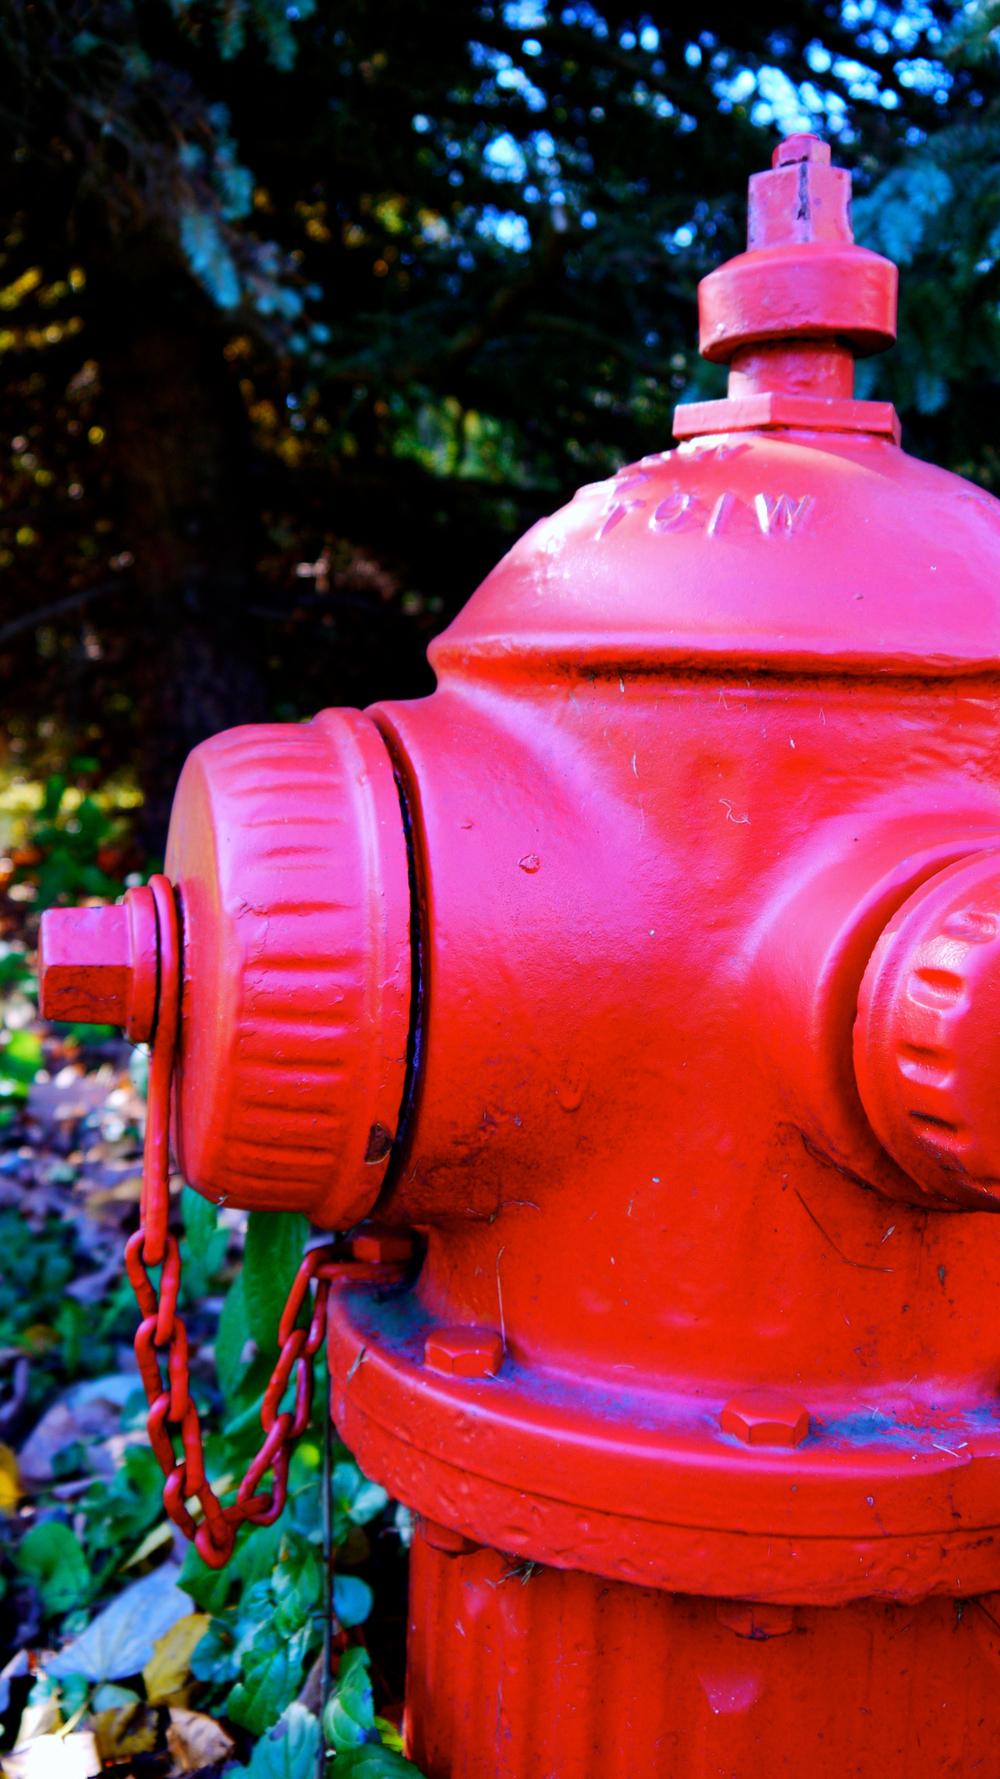 p1000451-fire-hydrant.jpg